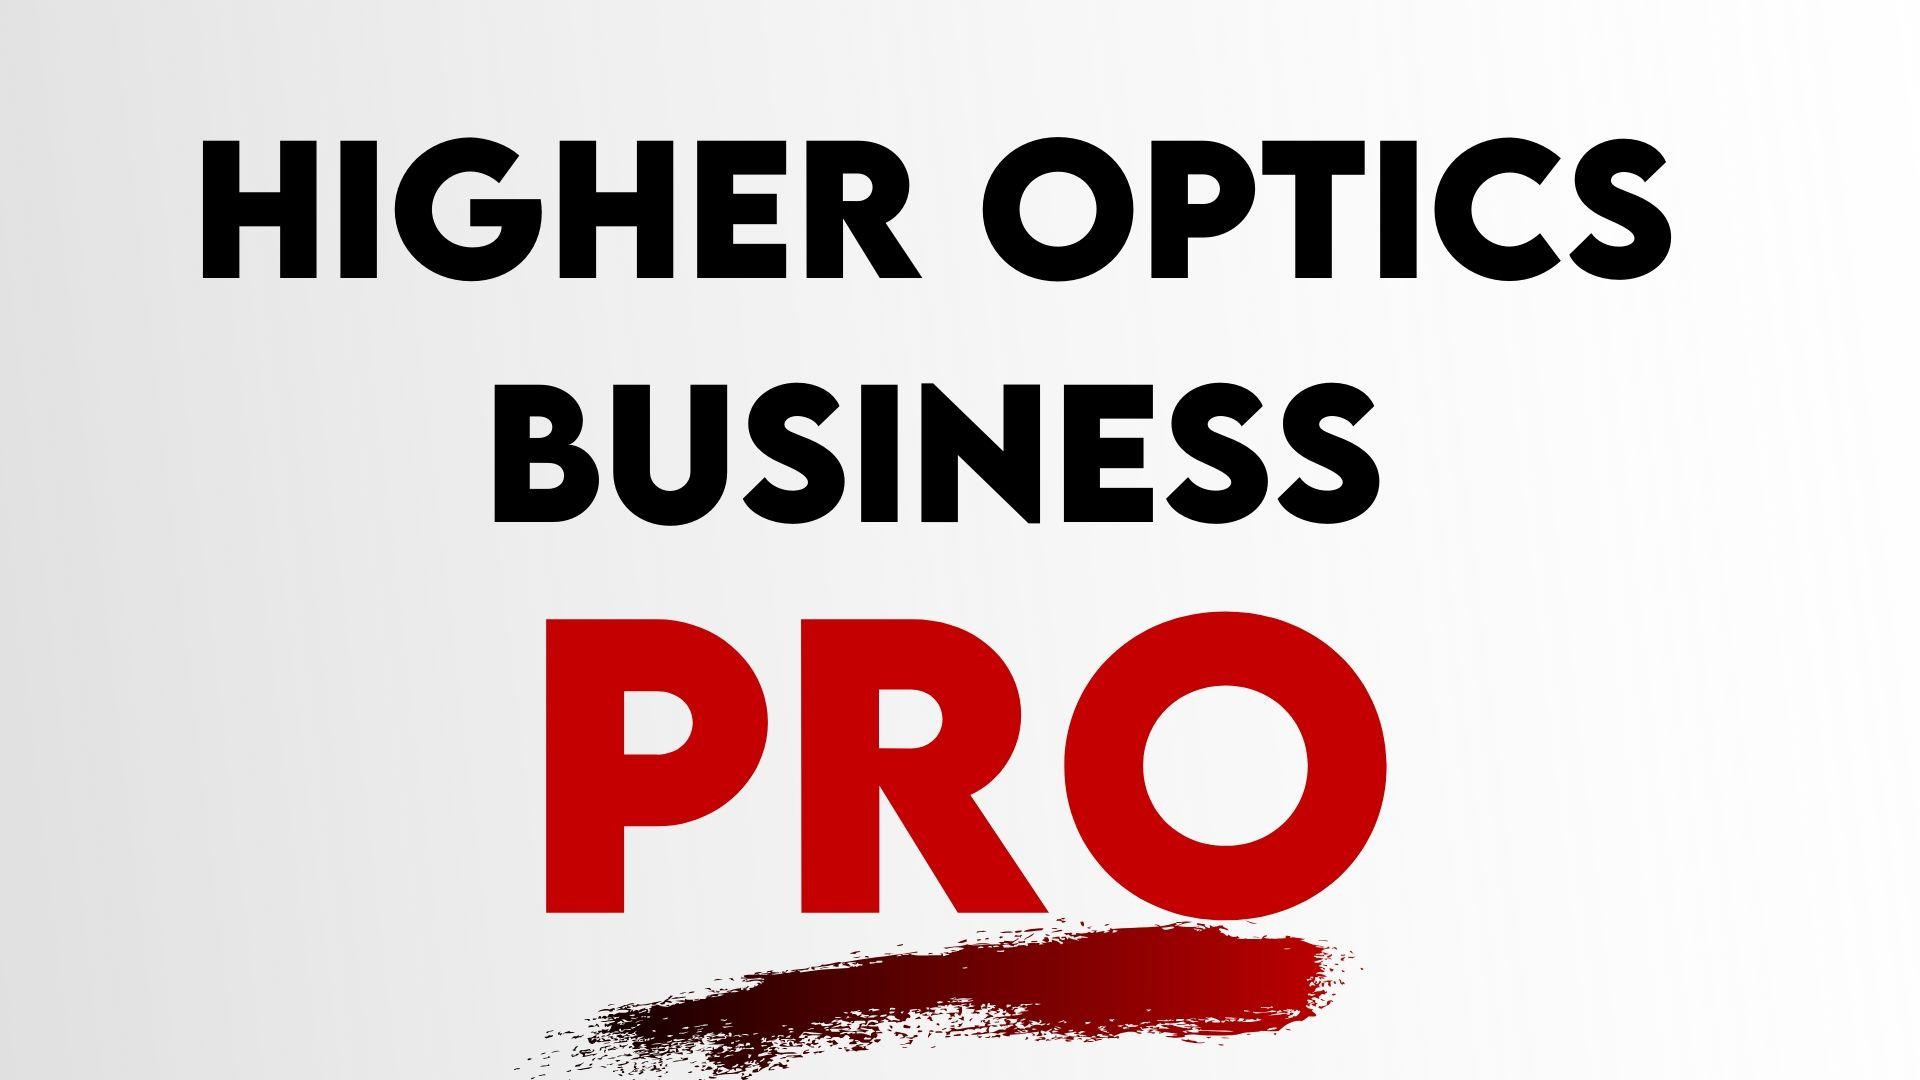 Higher Optics Business Pro